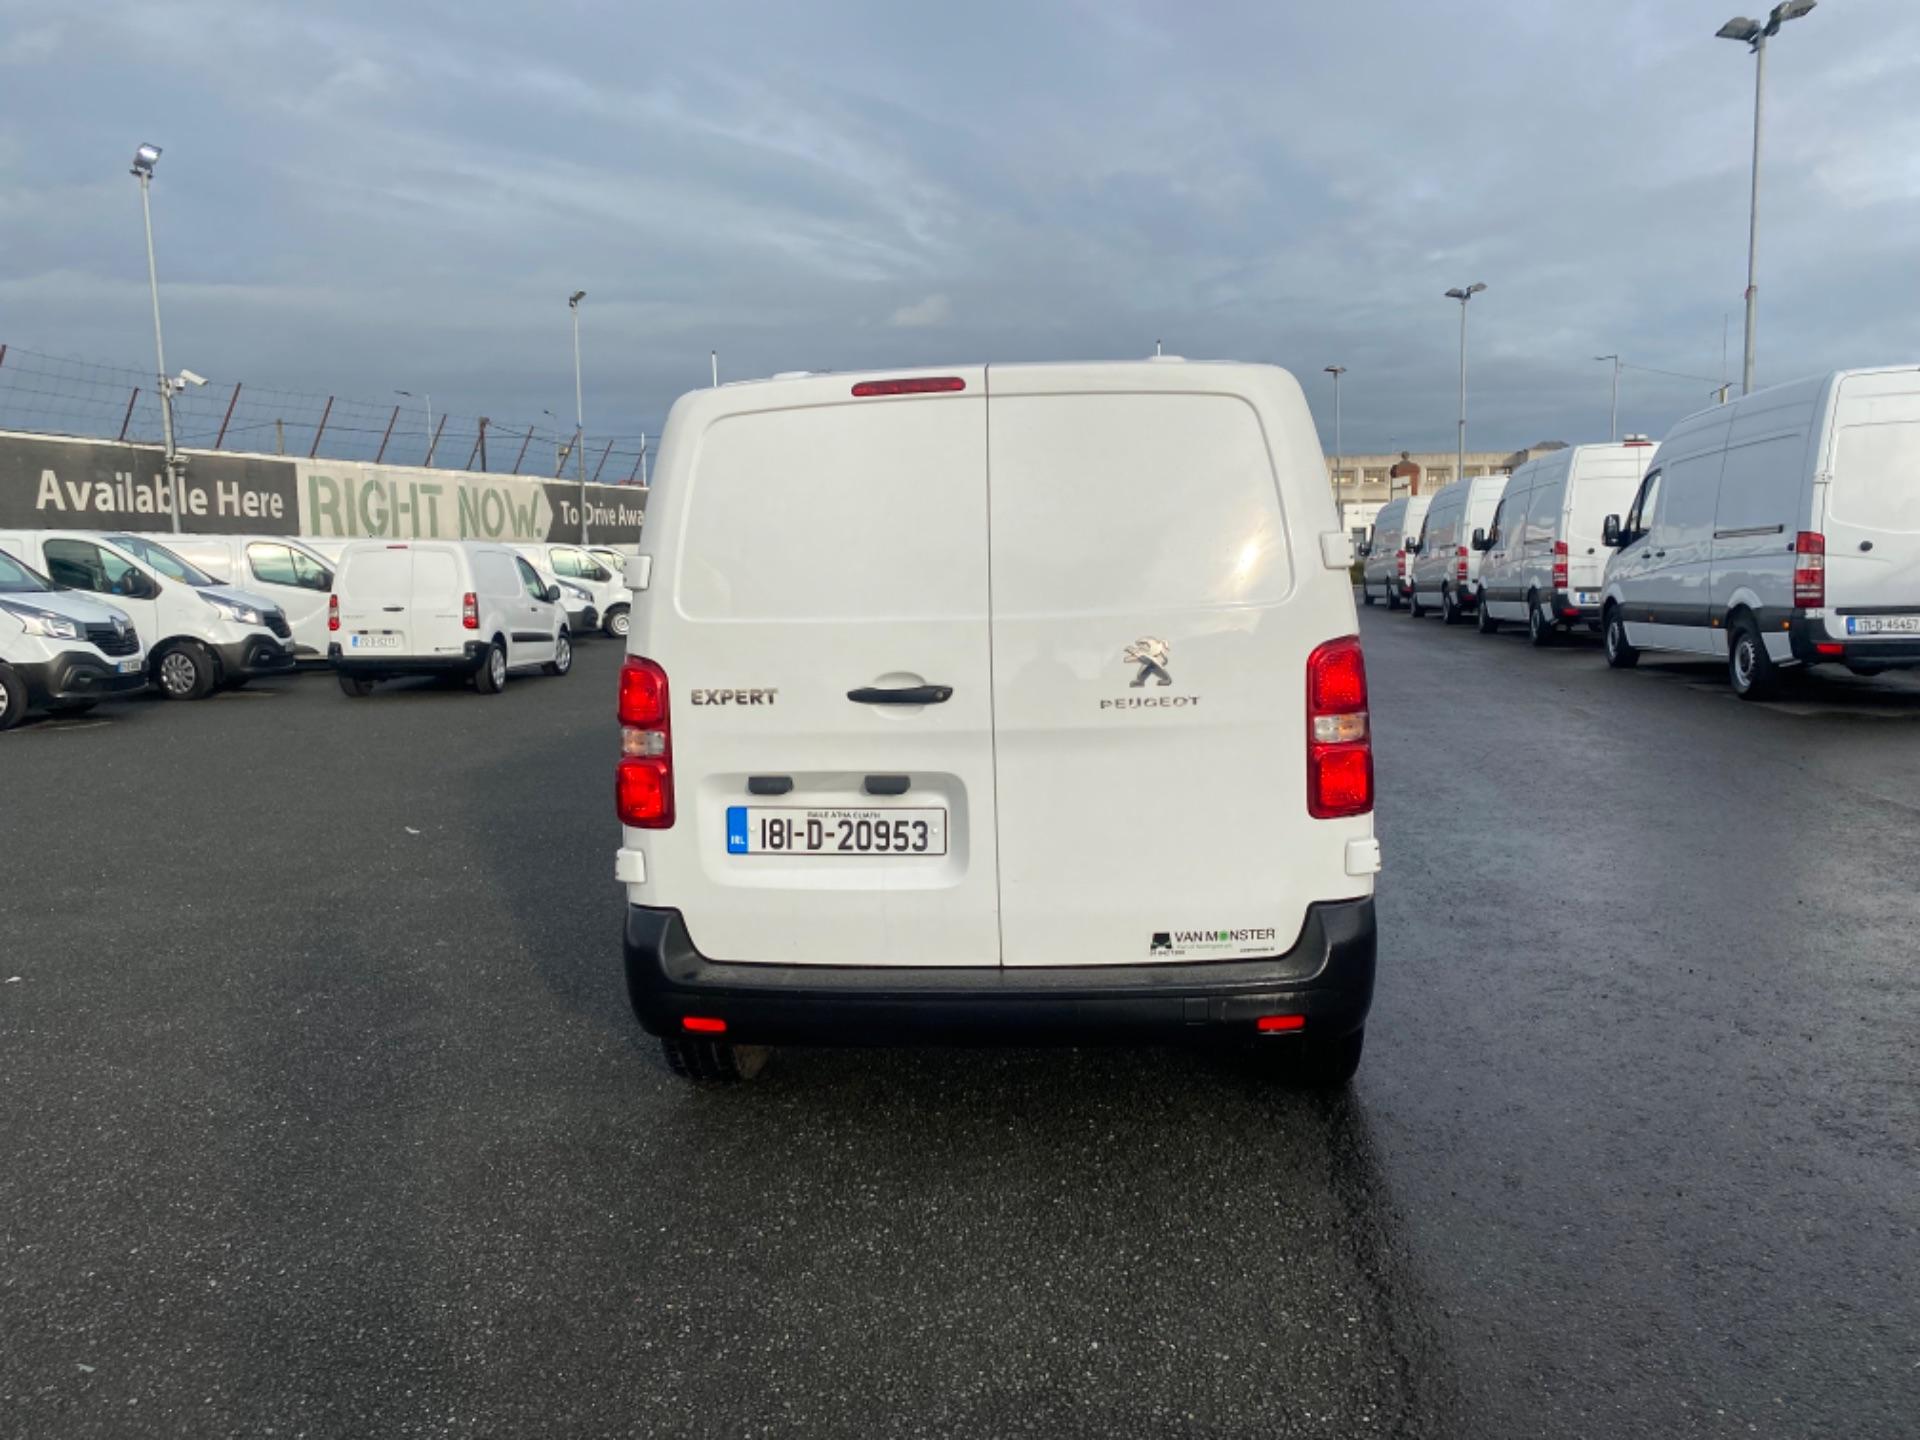 2018 Peugeot Expert Active Standard 1.6 Blue HDI 9 (181D20953) Image 5